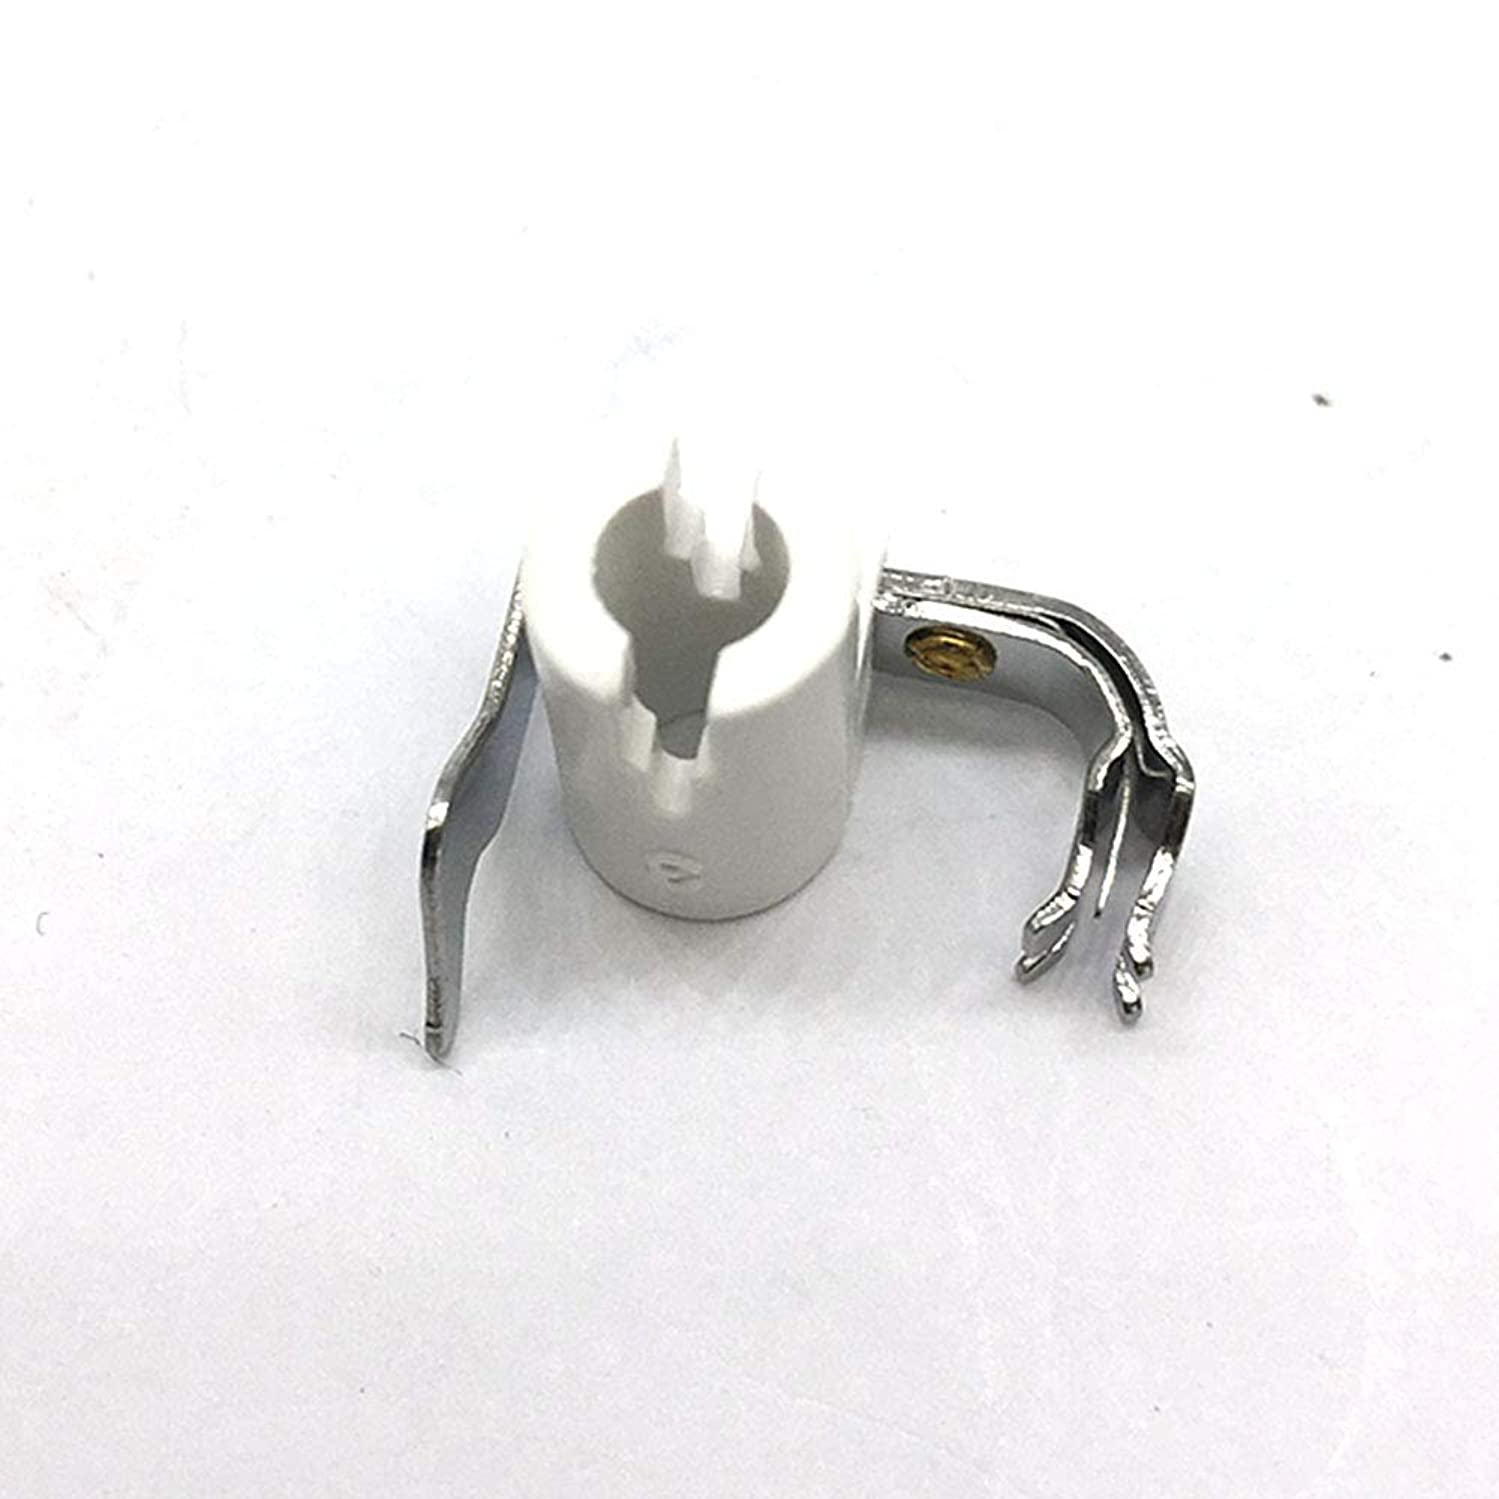 YICBOR Needle Threader 4161458-01 for Singer Simple 2263,3116, 3221, 3232, 3229,7380,8770 Curvy